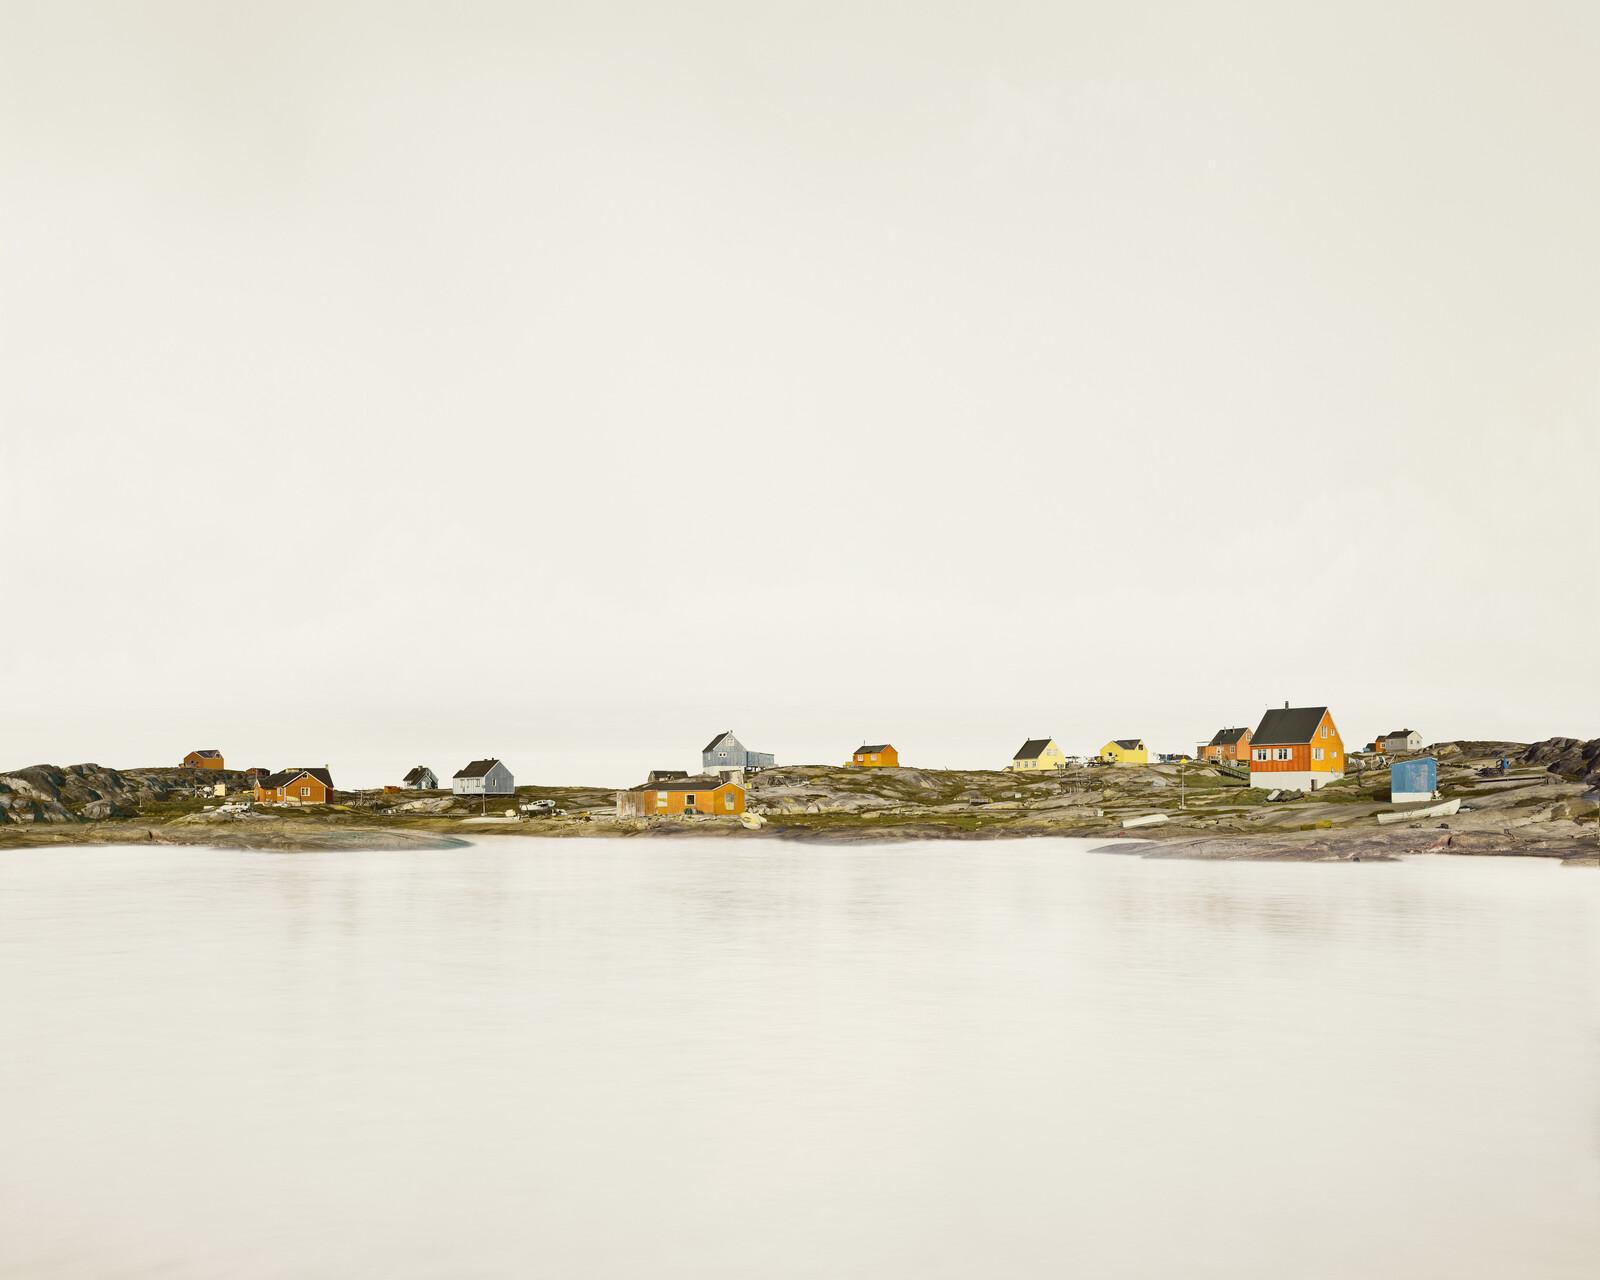 Uummannaq, Greenland - David Burdeny